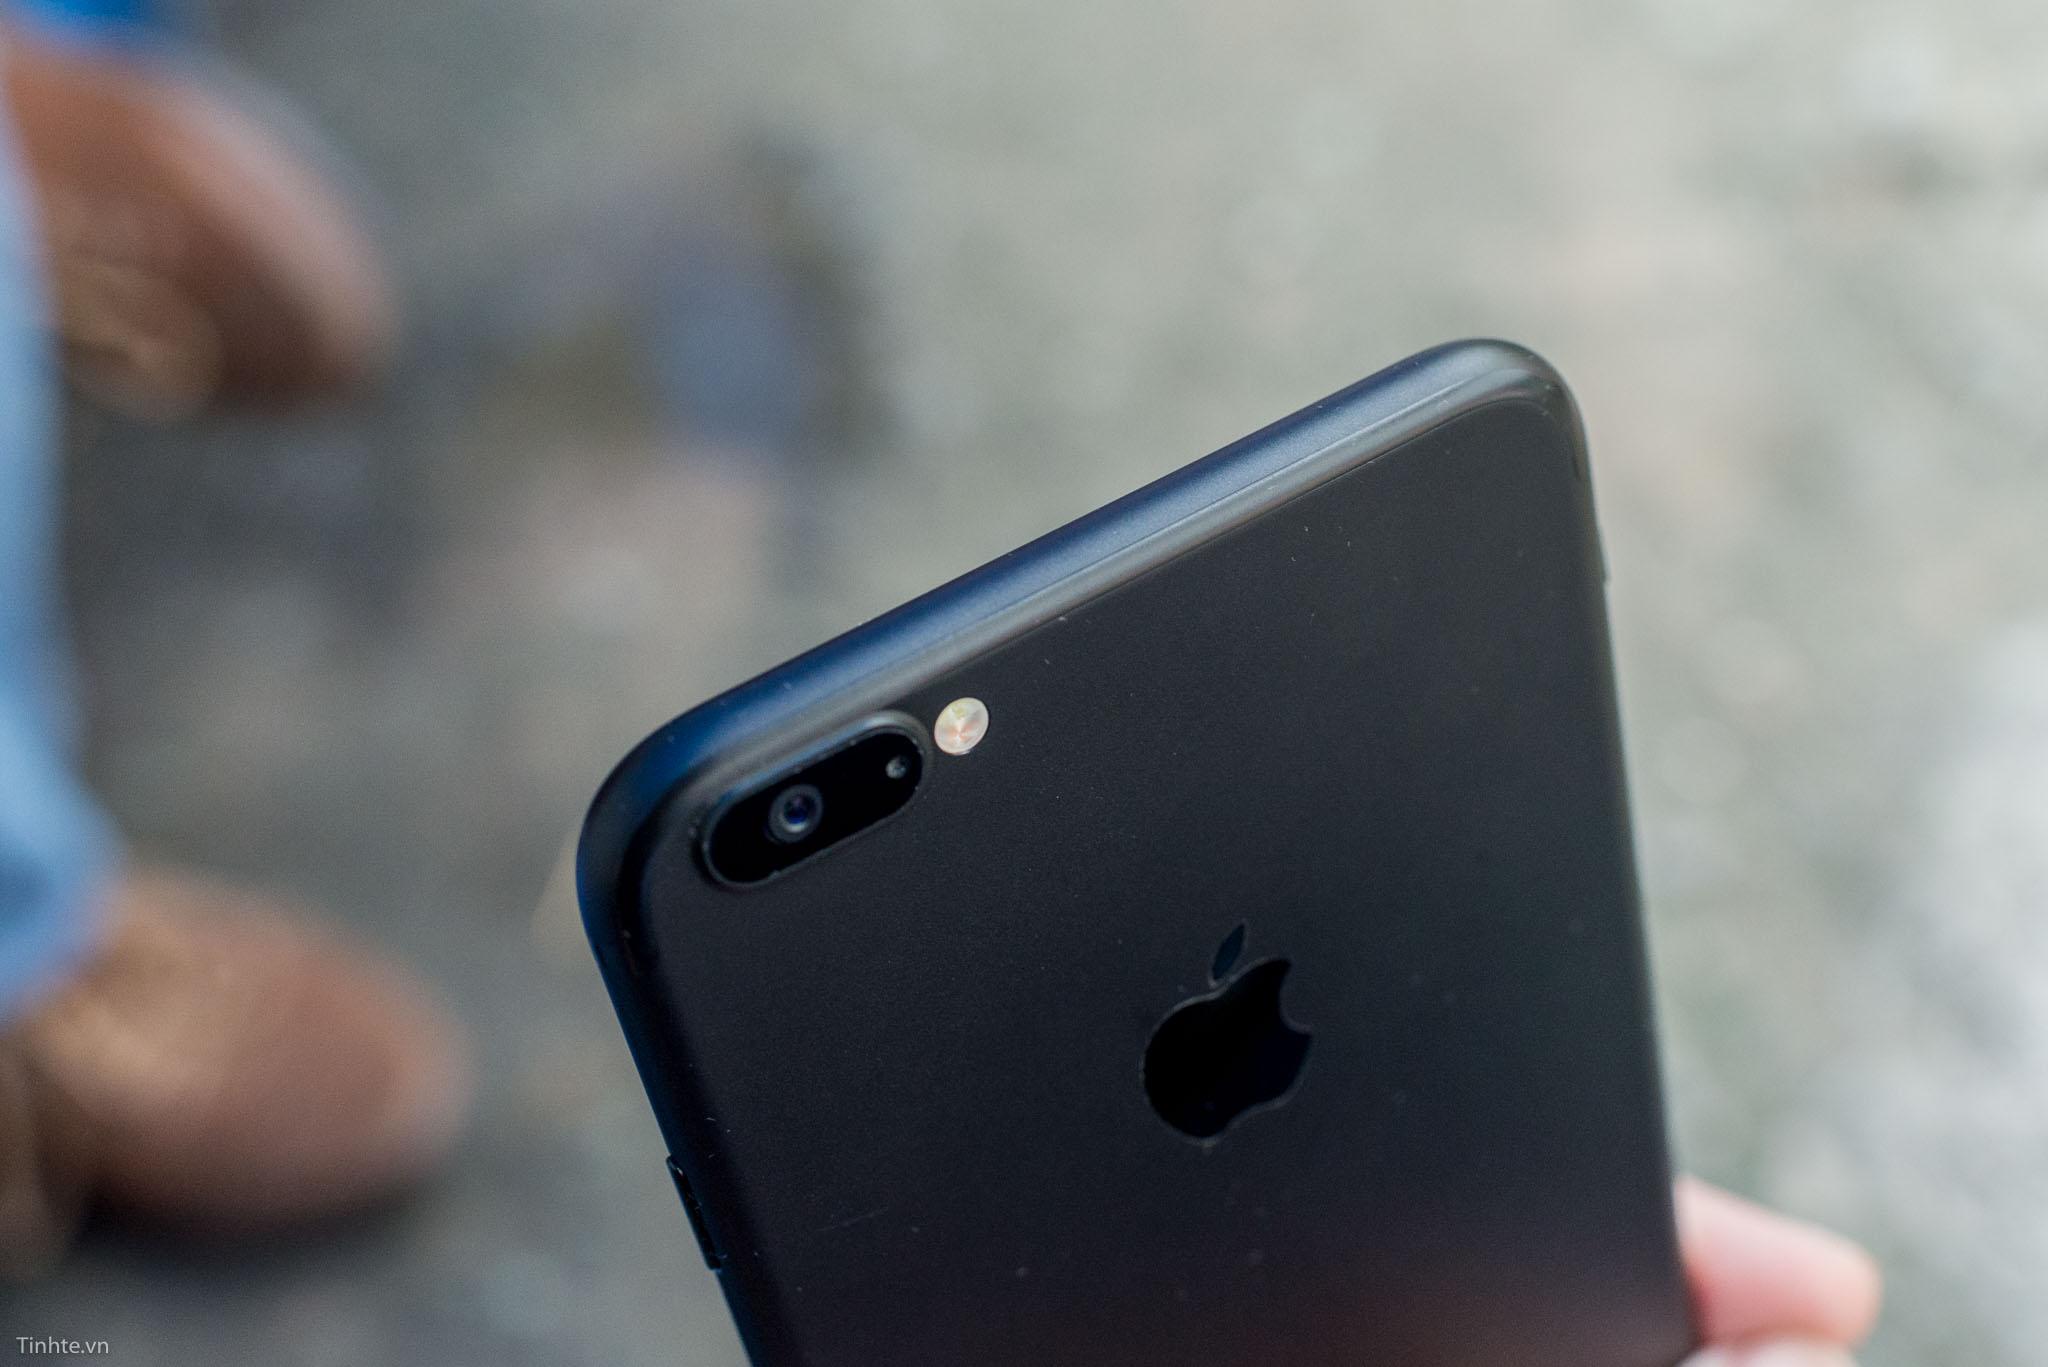 iphone-7-plus-len-vo-tinhte-21.jpg